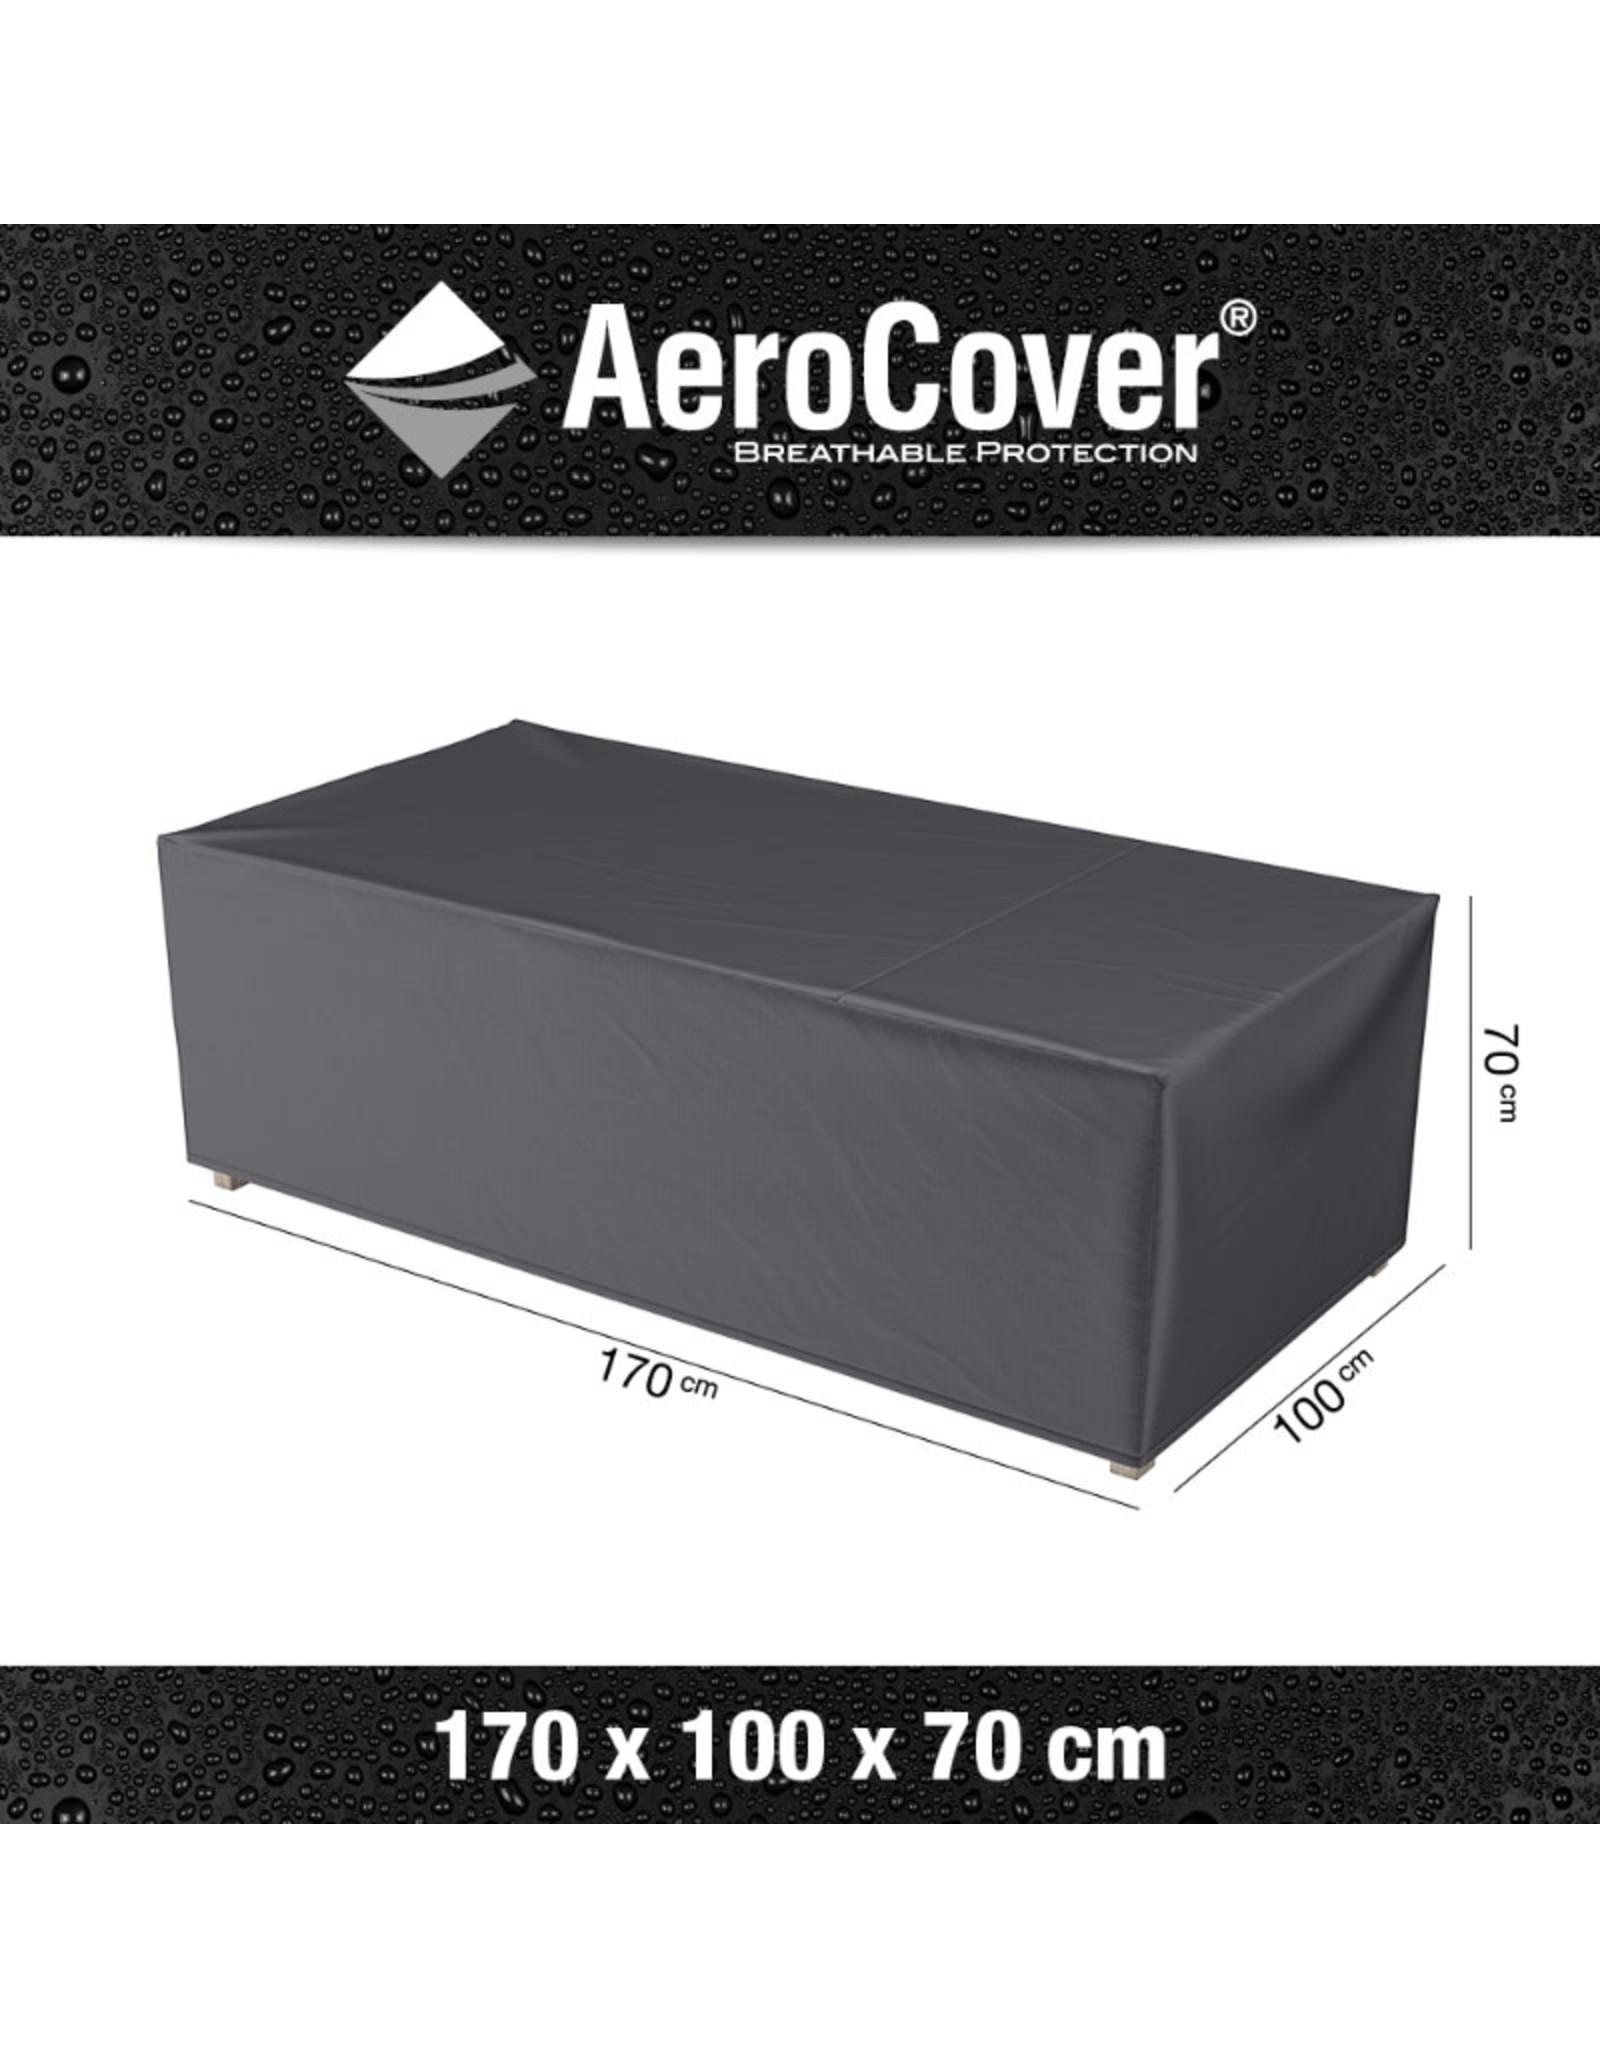 Aerocover AeroCover Lounge set cover 170x100xH70